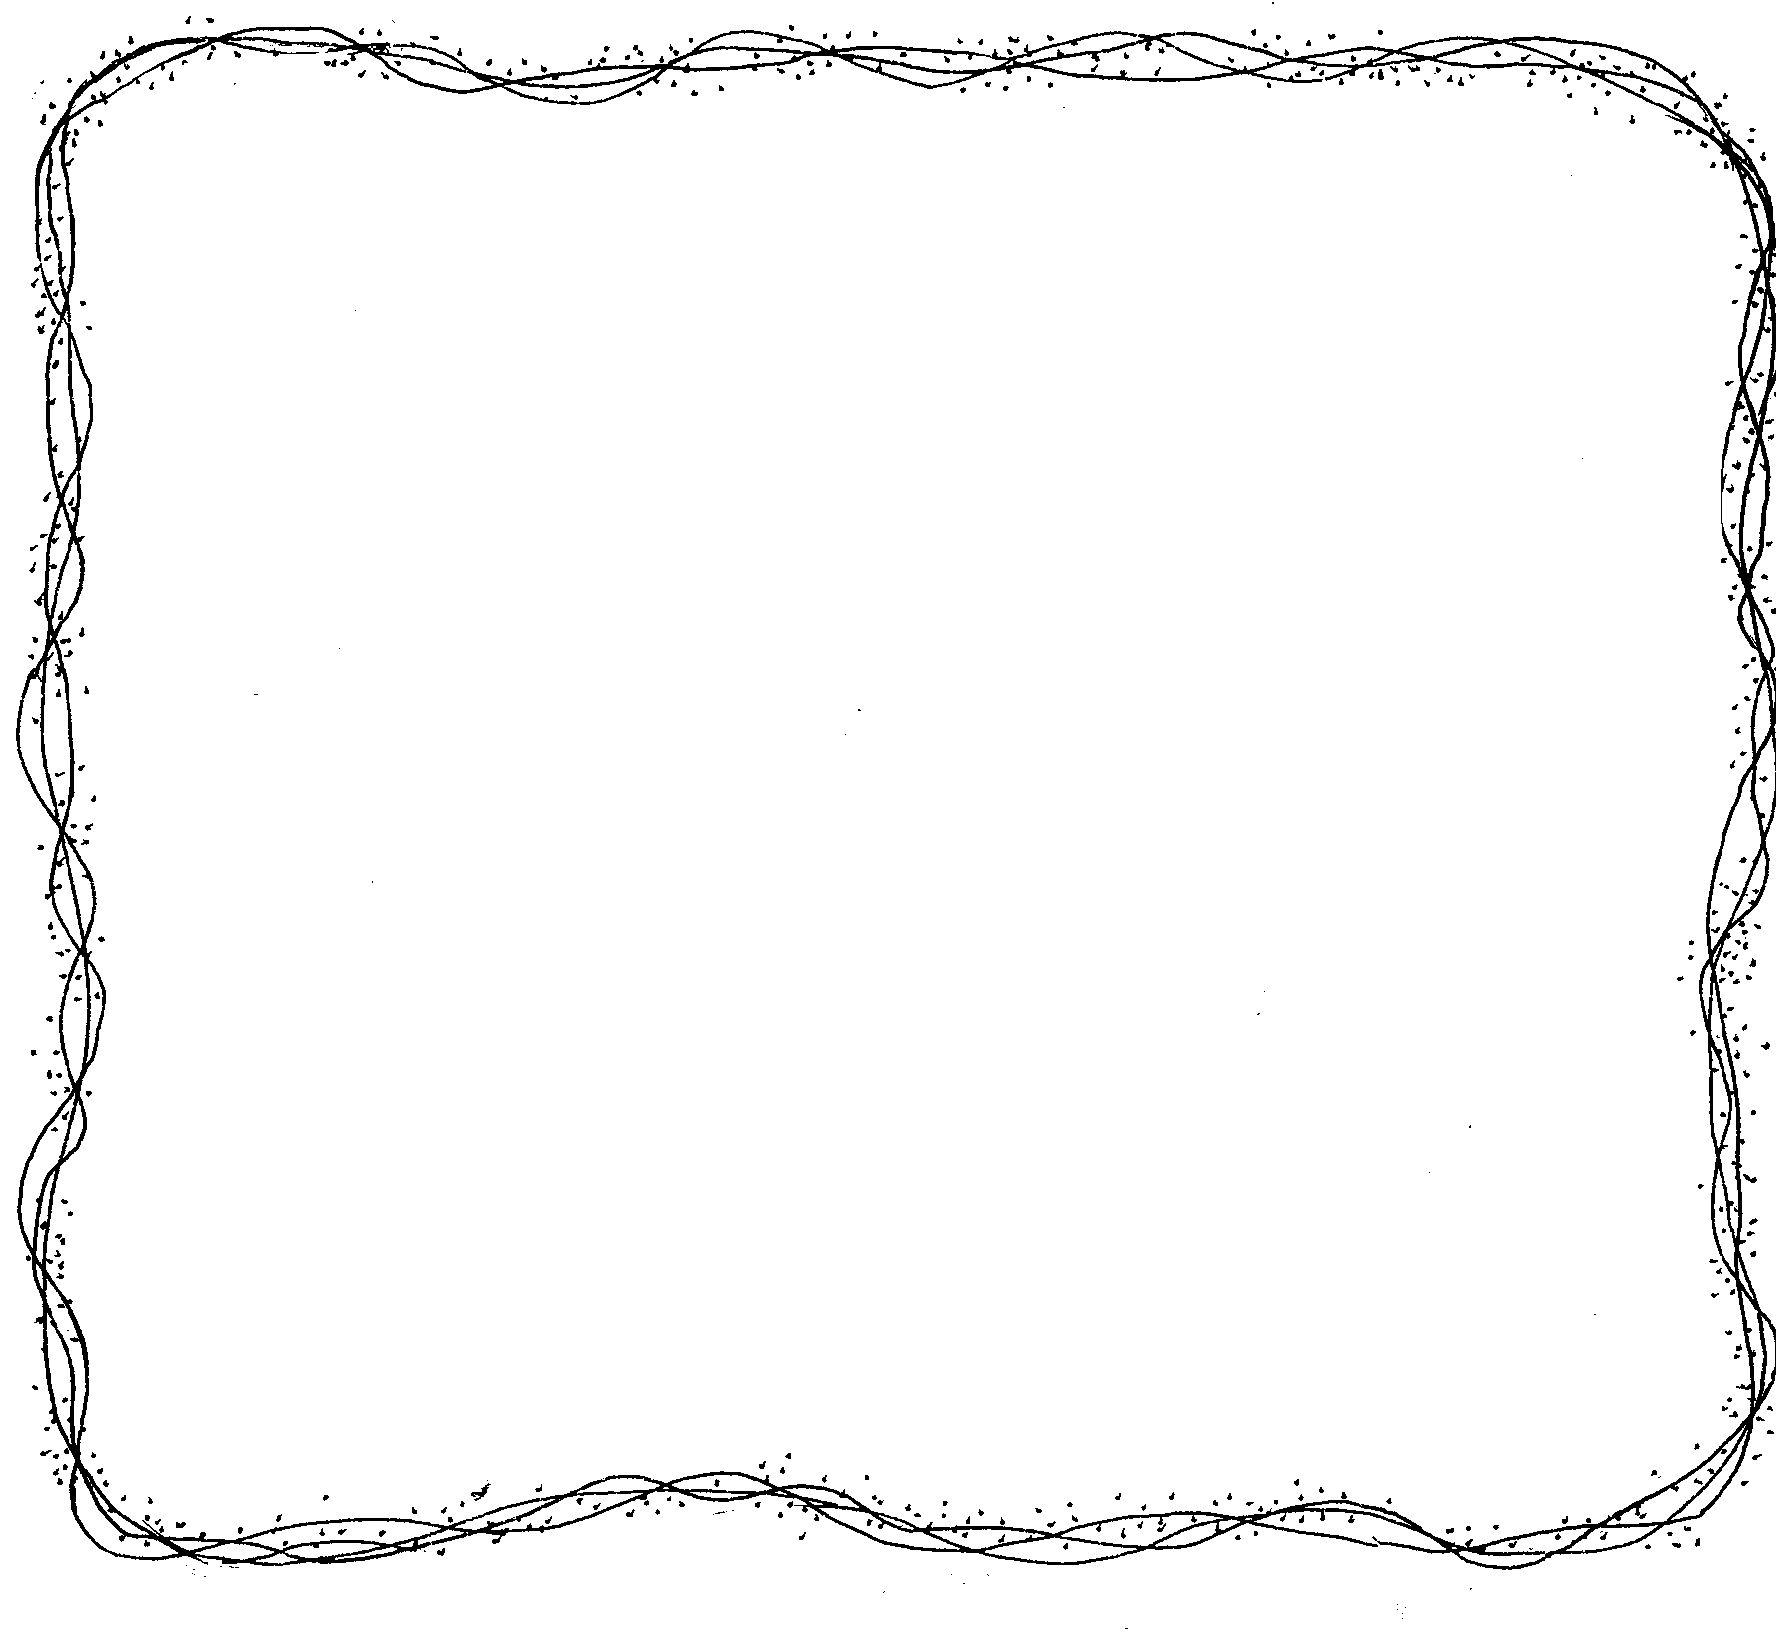 Wavy line border clipart free clipart transparent library Mormon Share } Border - Wavy Lines | Primary | Lds object ... clipart transparent library